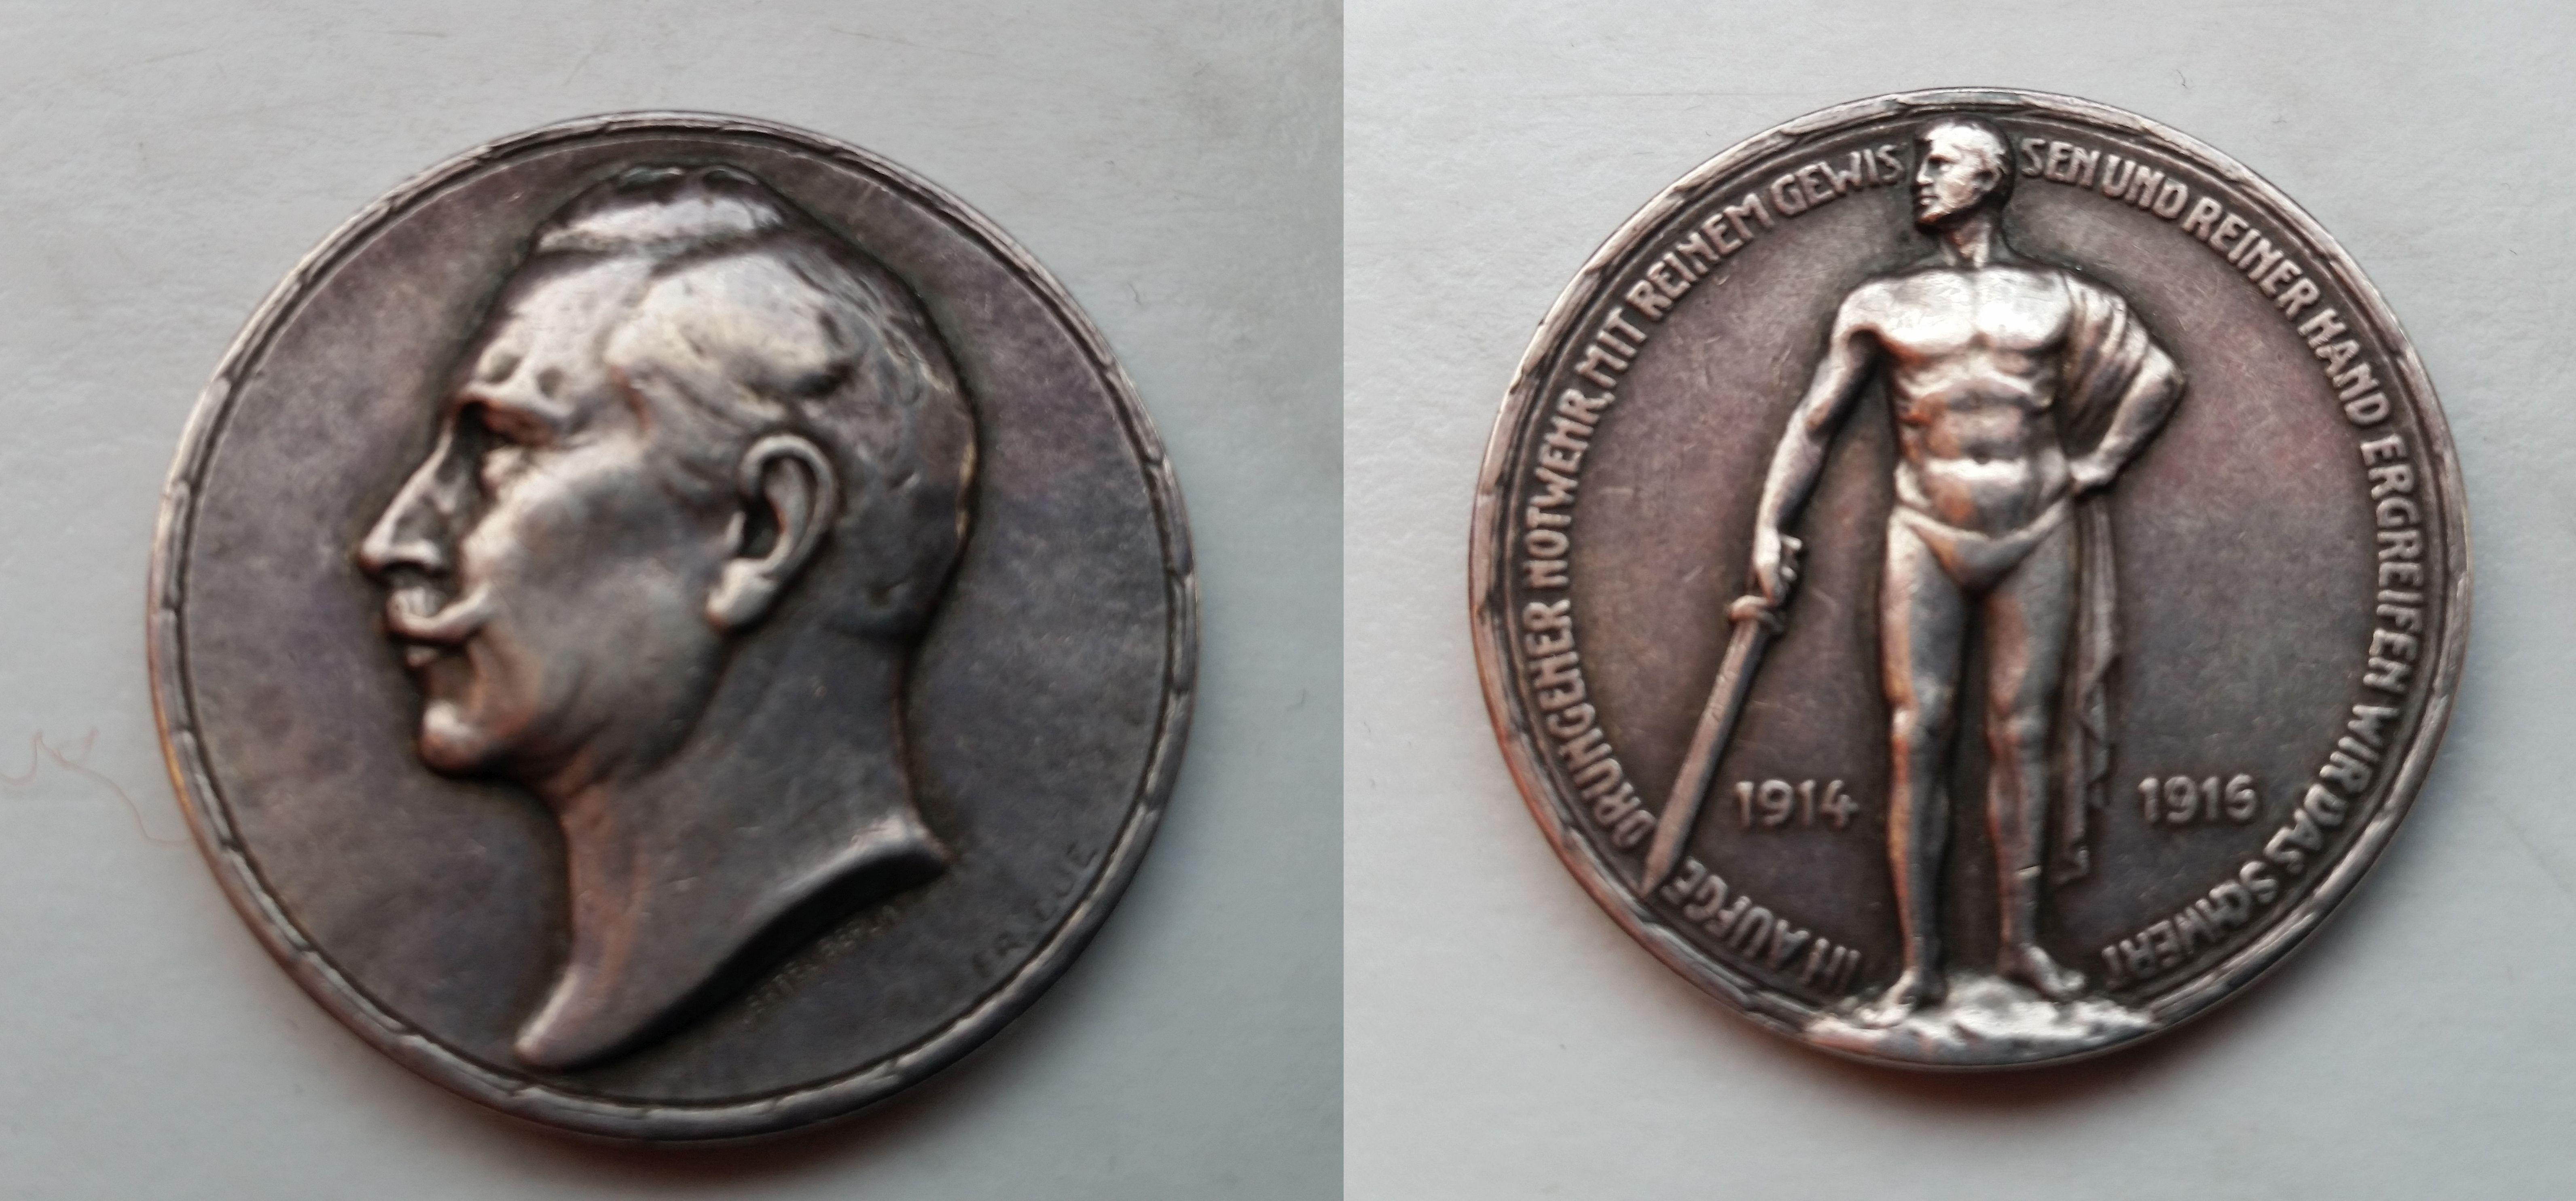 Medaille 1914-1916  Zetzmann unbek..jpg